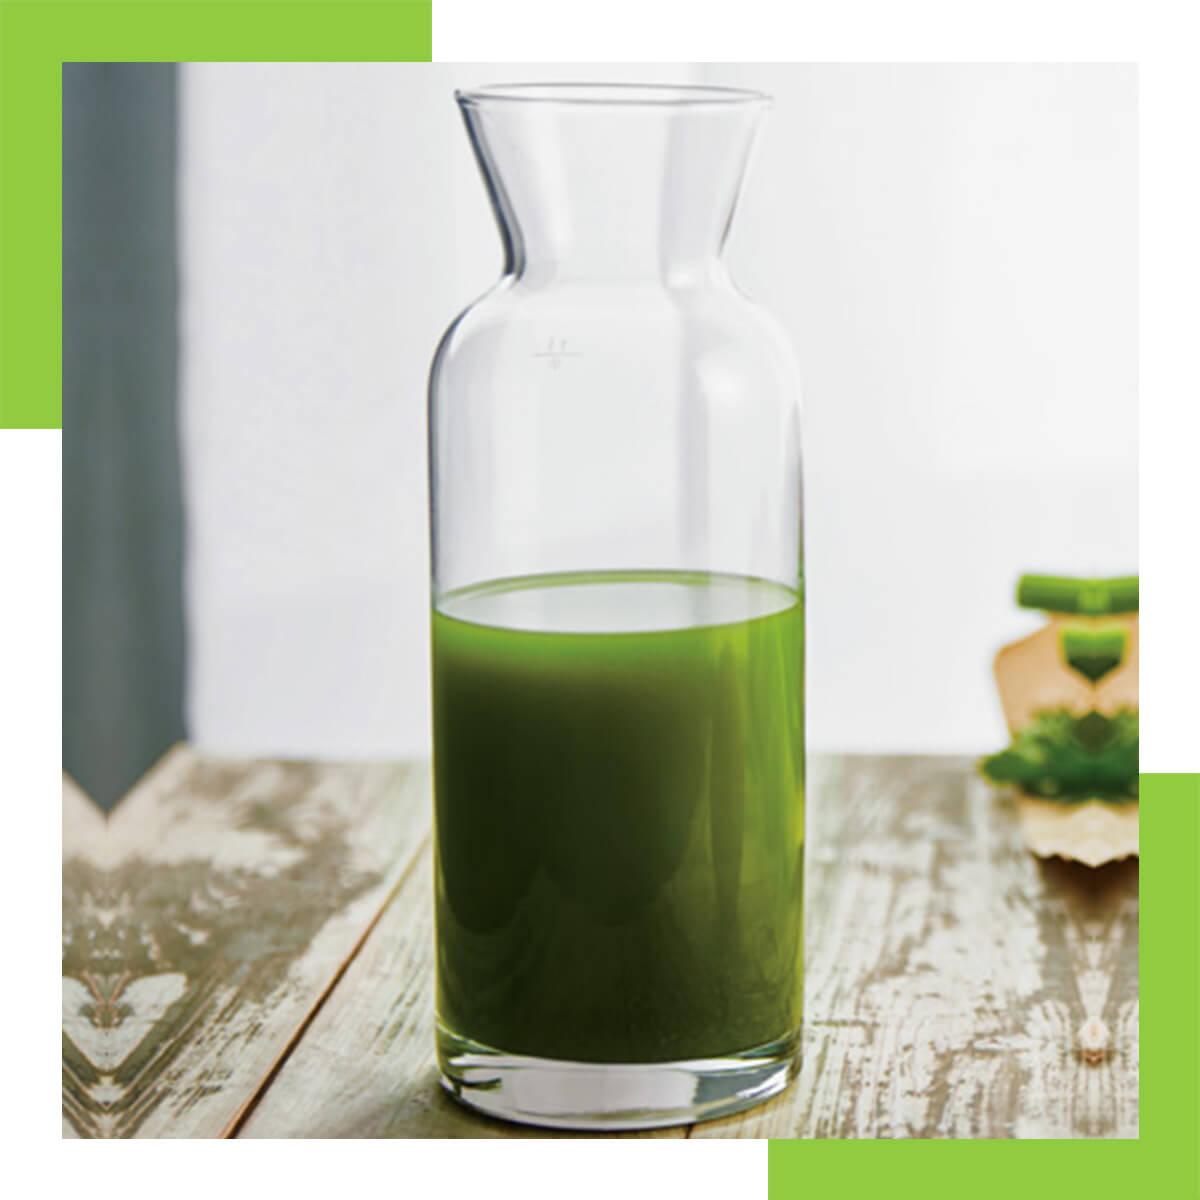 Popeye Juice